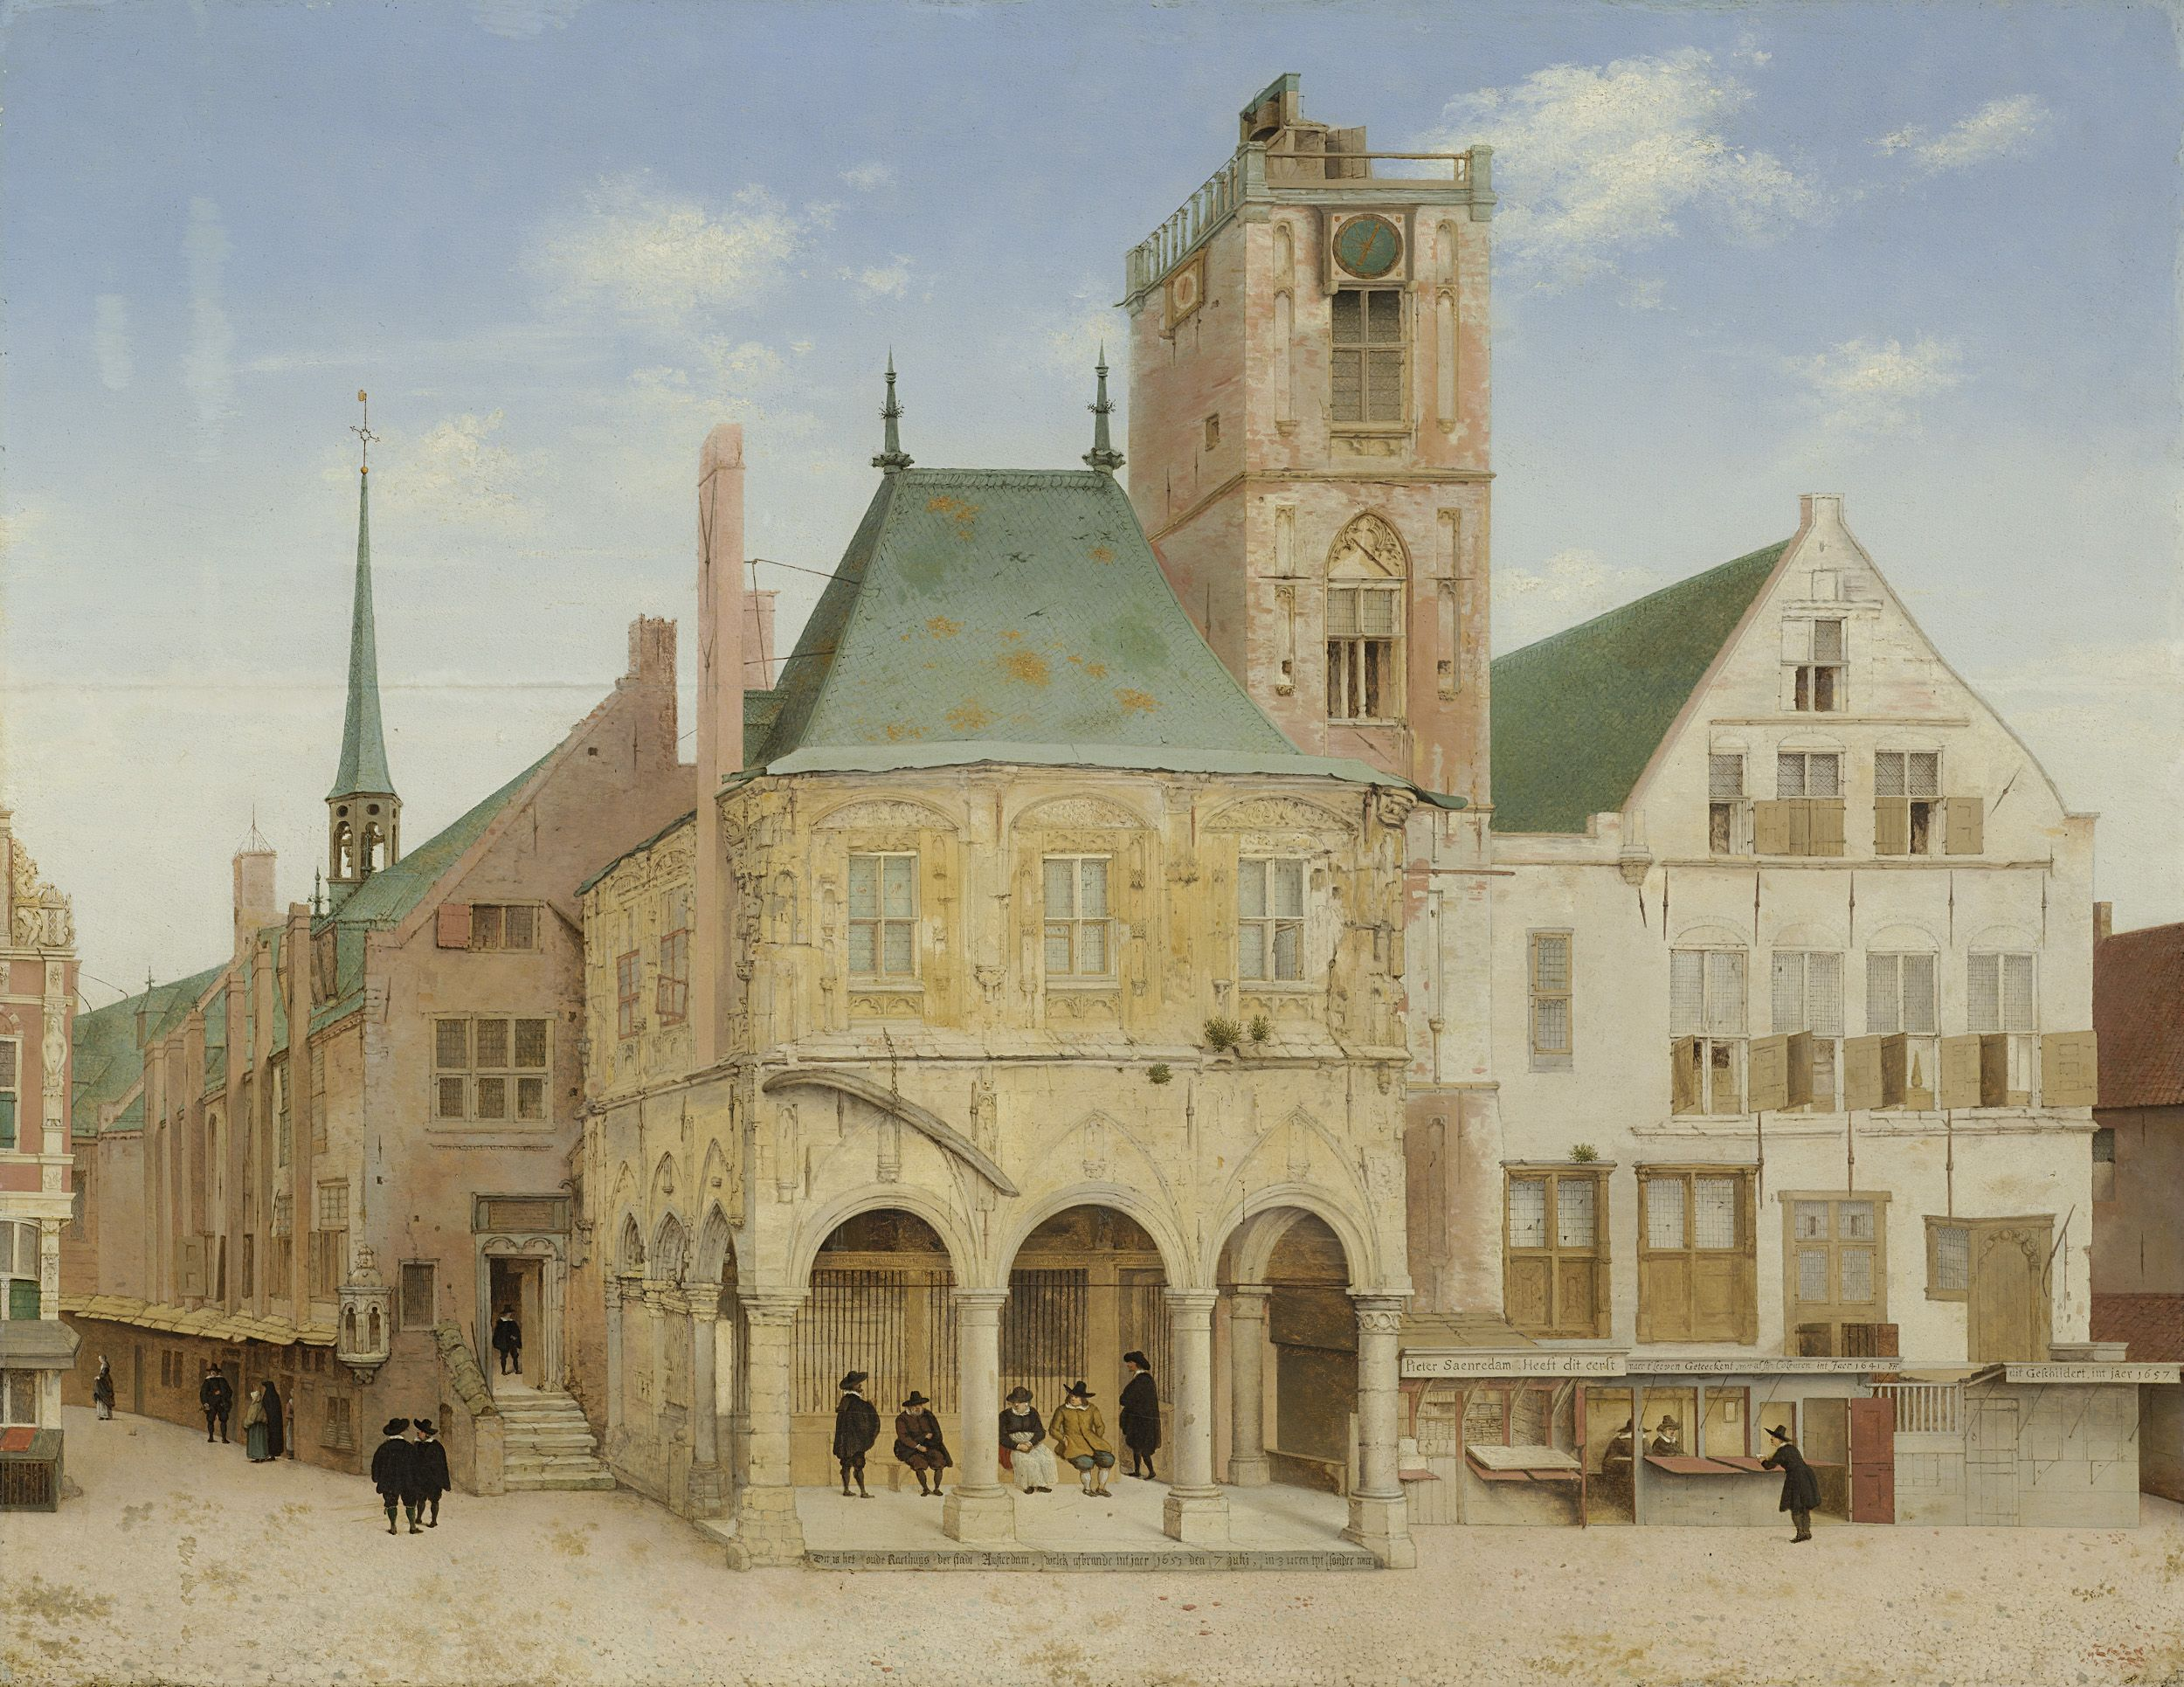 The Old Town Hall Of Amsterdam Pieter Jansz Saenredam 1657 In 2020 Amsterdam Art Dutch Painters Haarlem